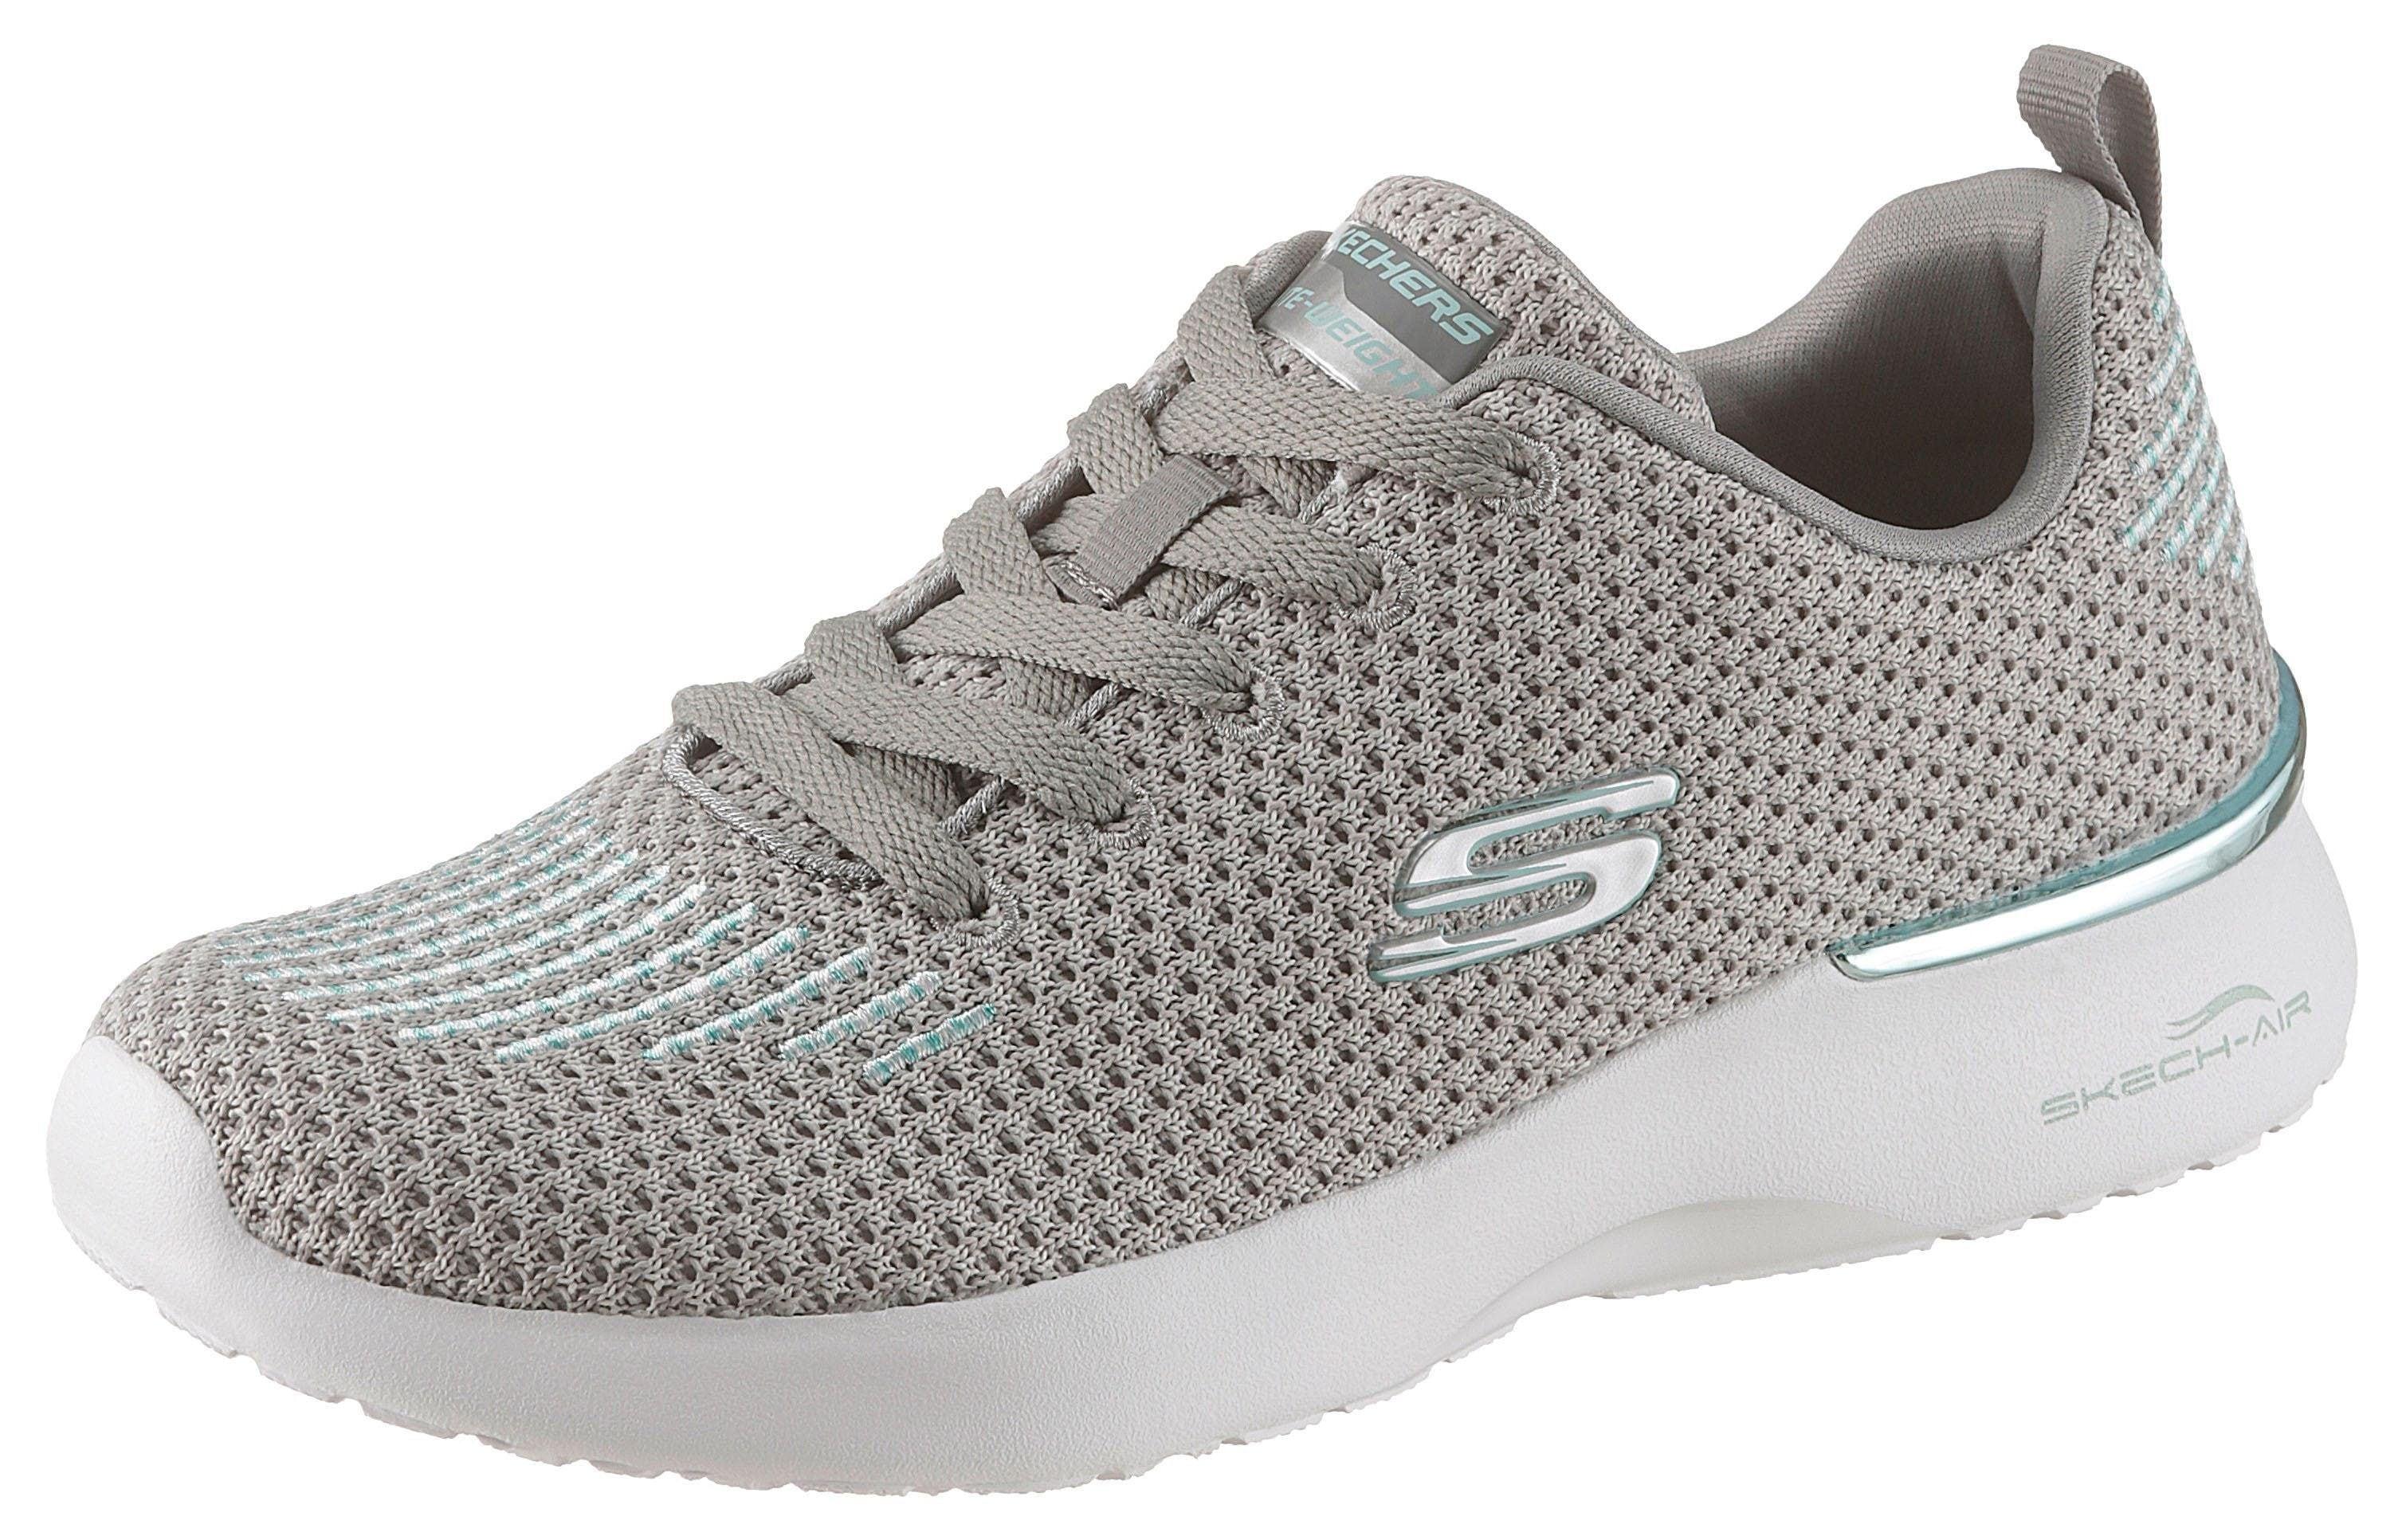 Skechers Sneaker Skech-Air Dynamight grau Damen Schnürhalbschuh Halbschuhe